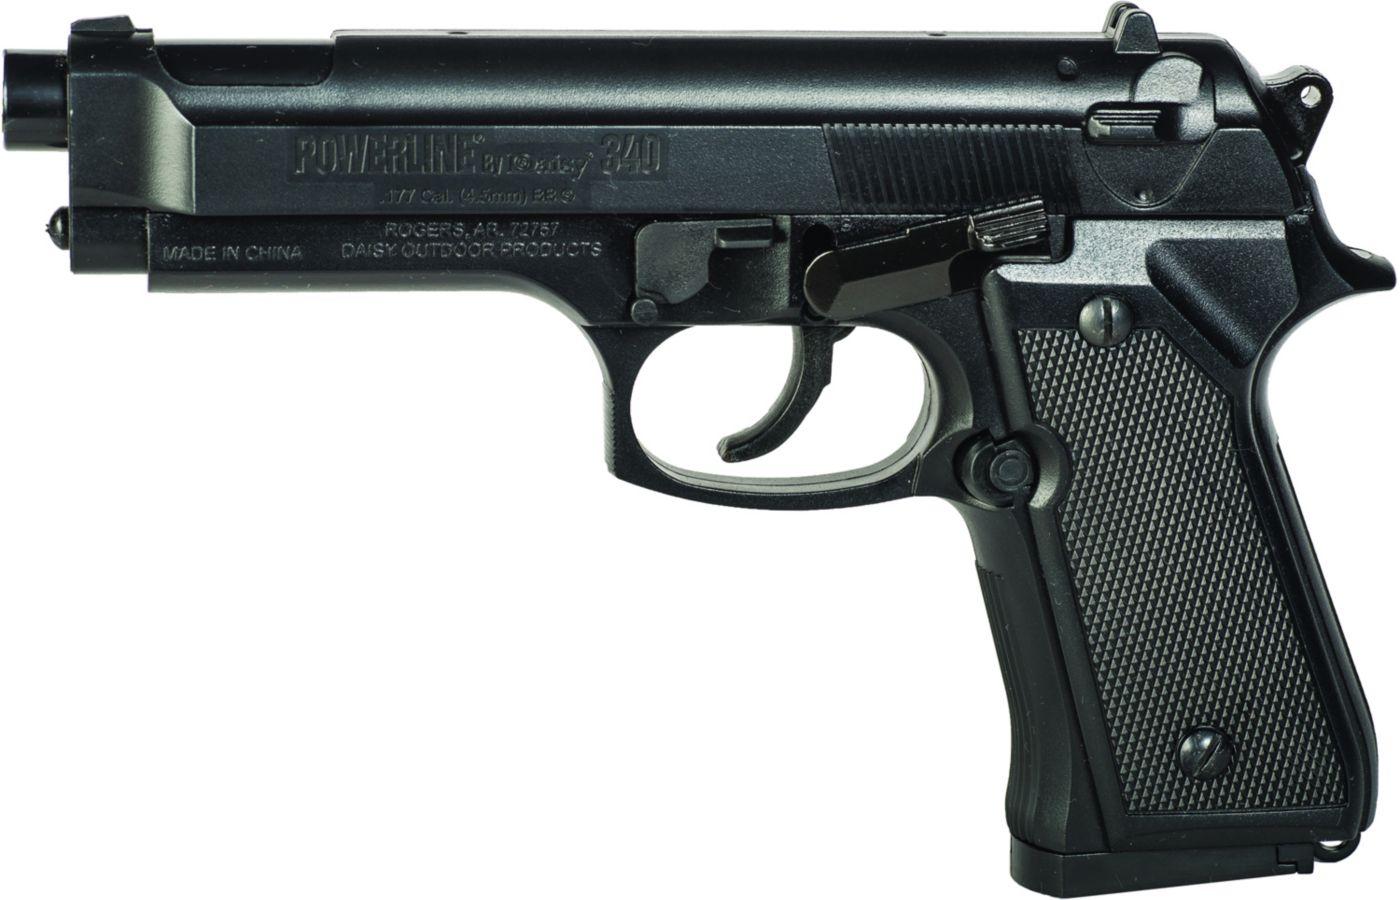 Daisy PowerLine Model 340 BB Gun